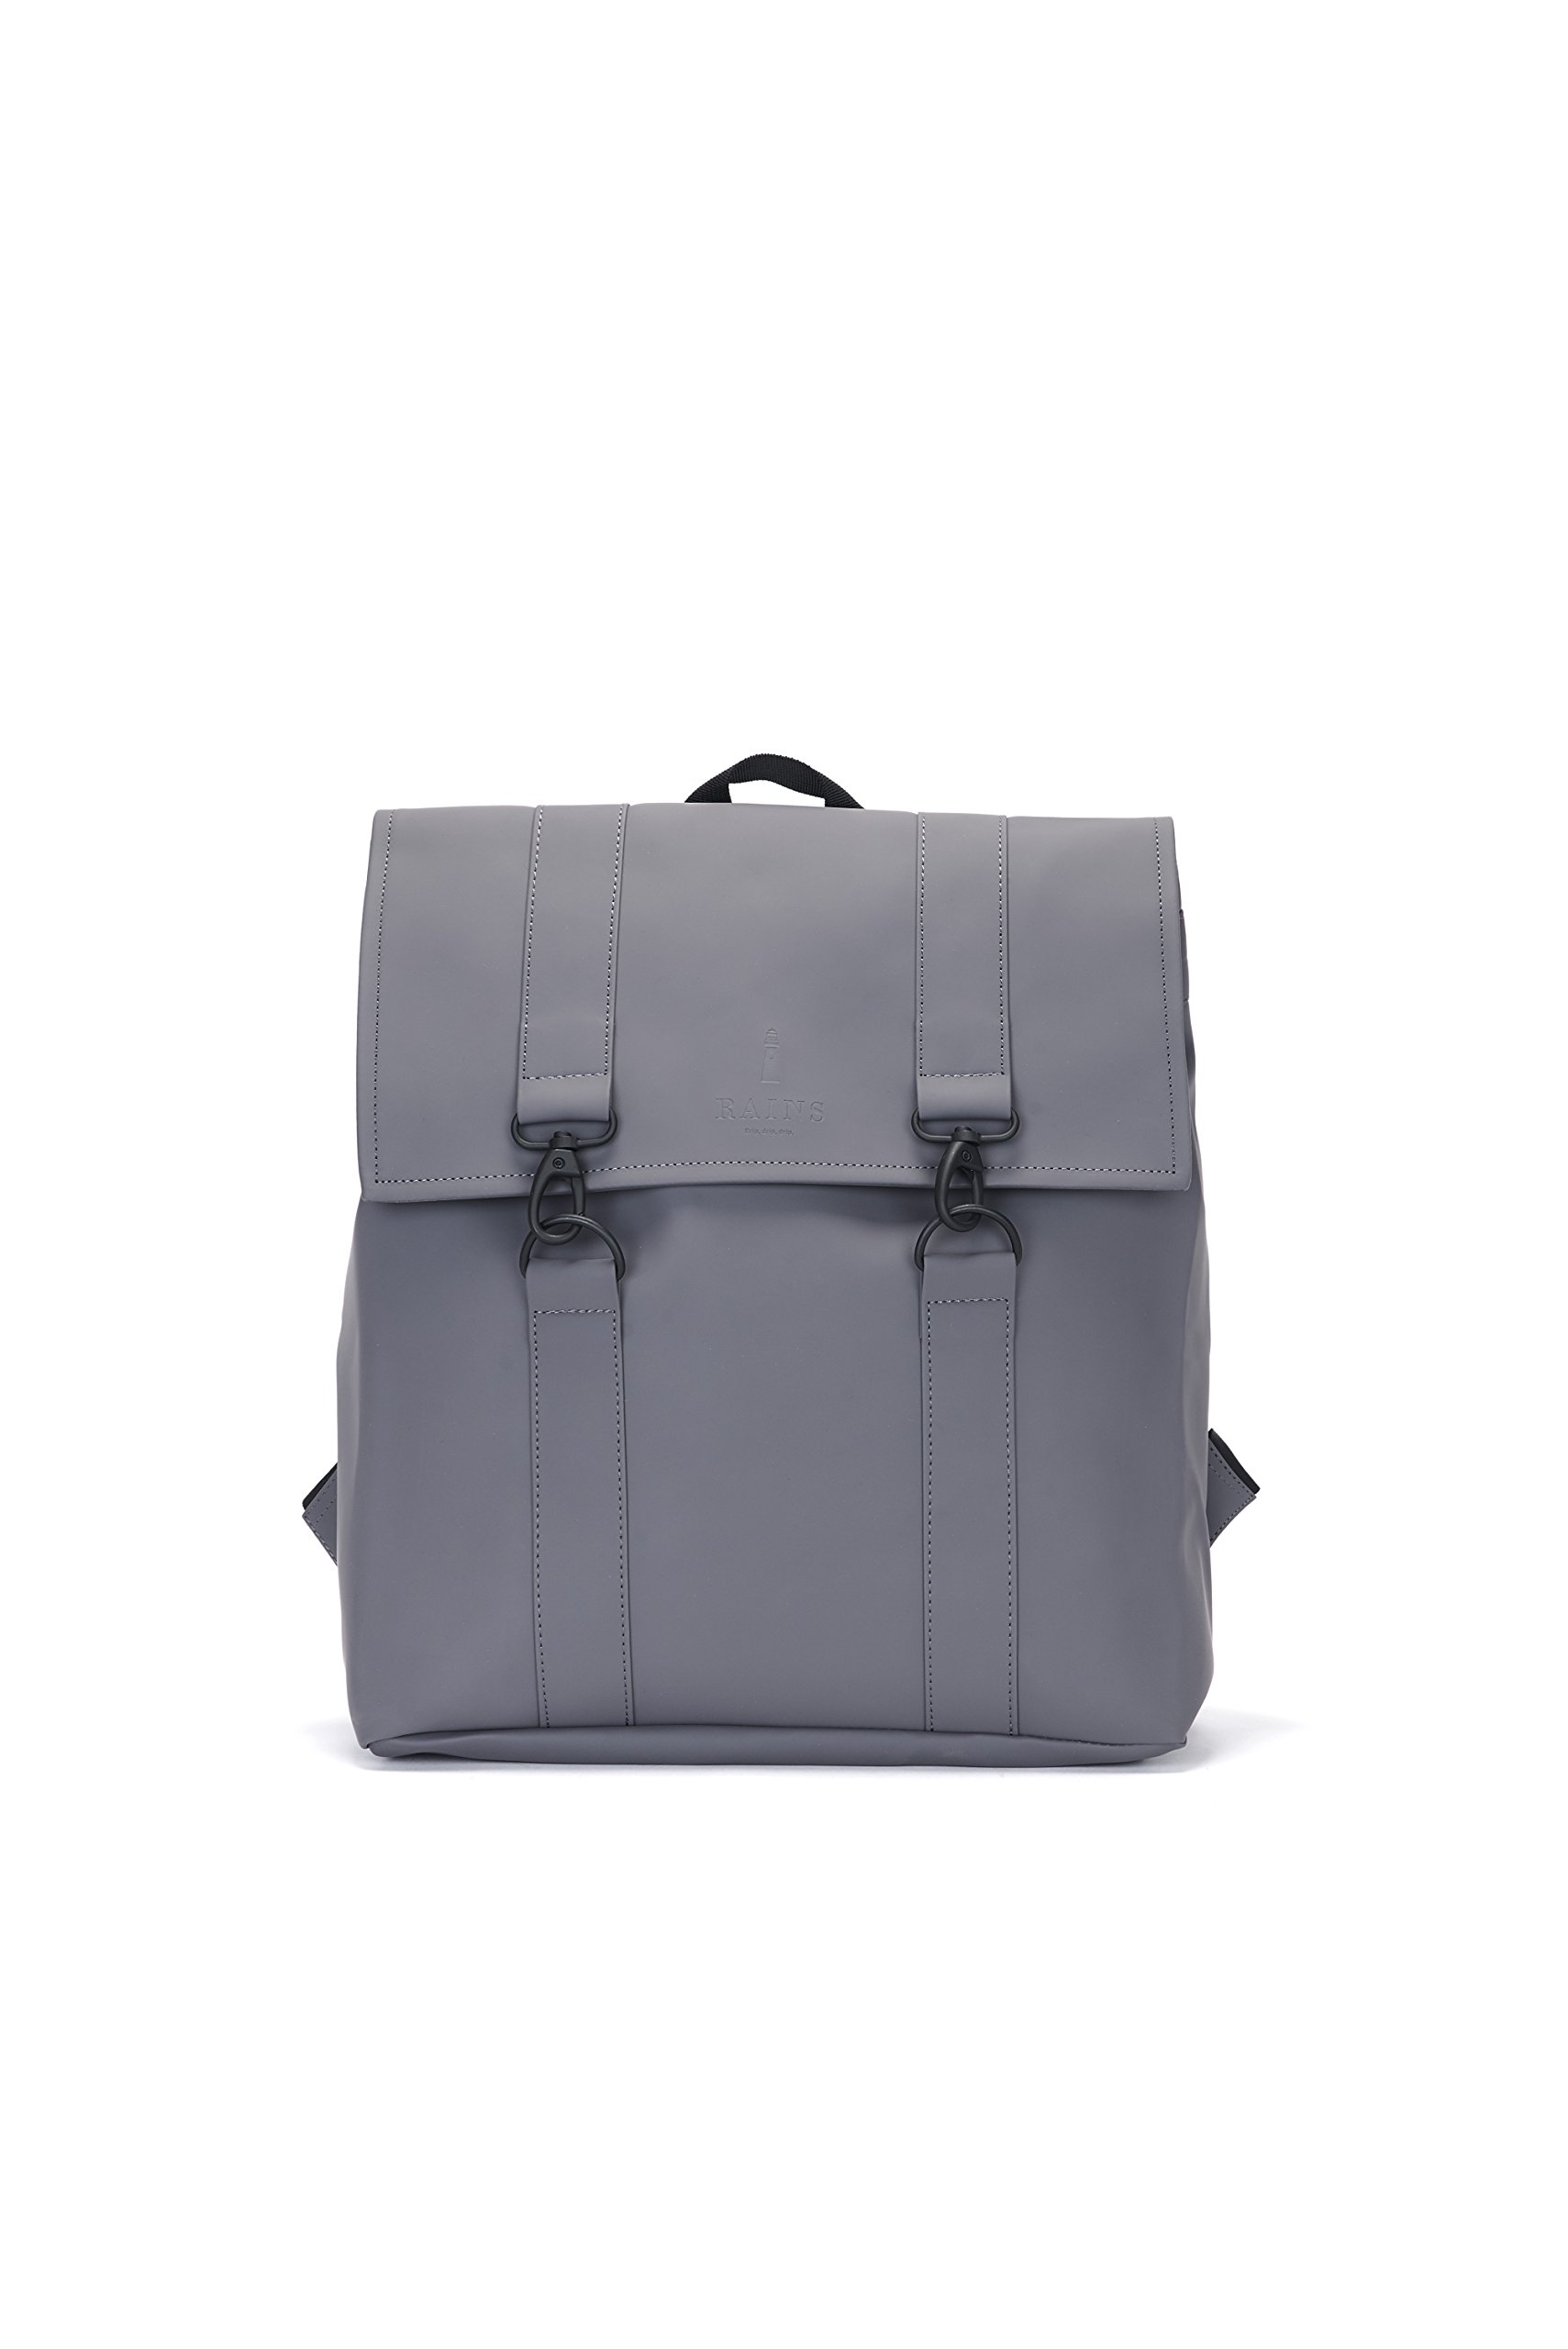 Rains Msn Backpack One Size Smoke